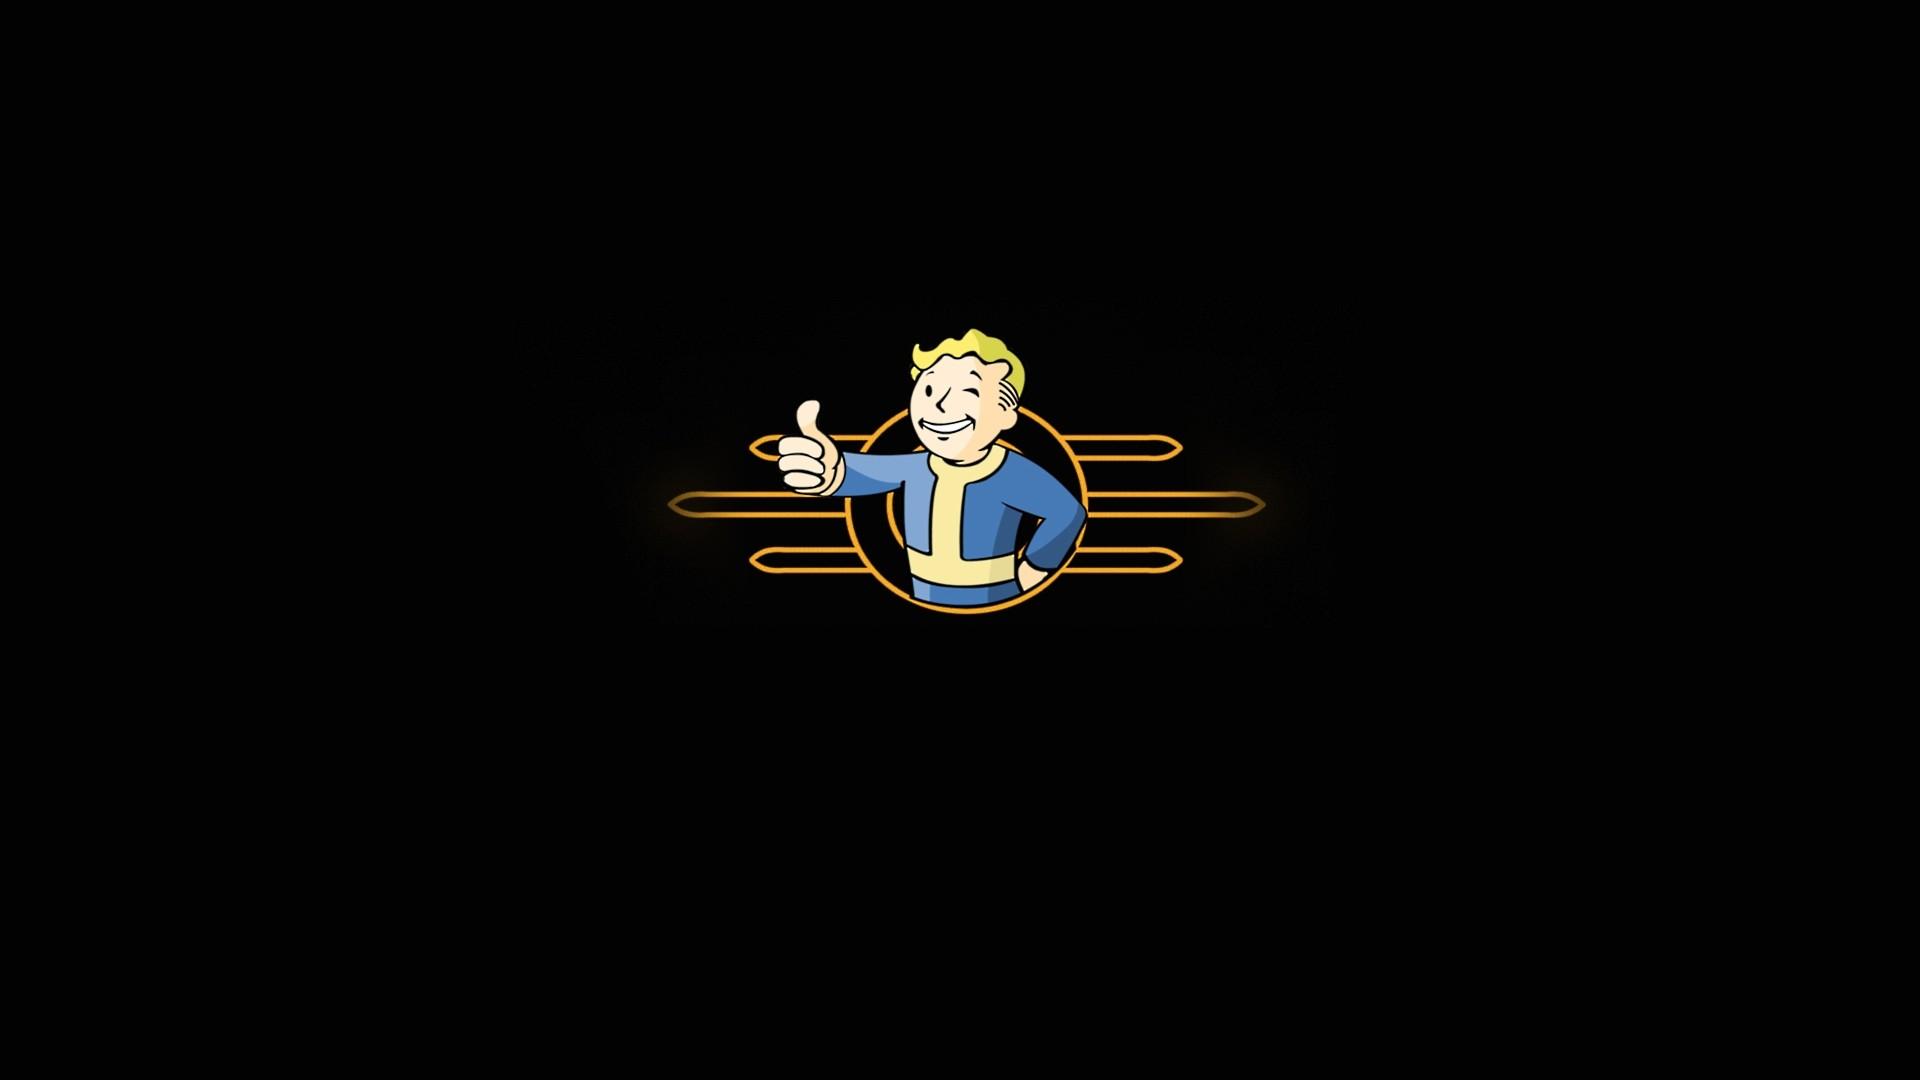 WallpapersWide.com | Fallout HD Desktop Wallpapers for Widescreen .